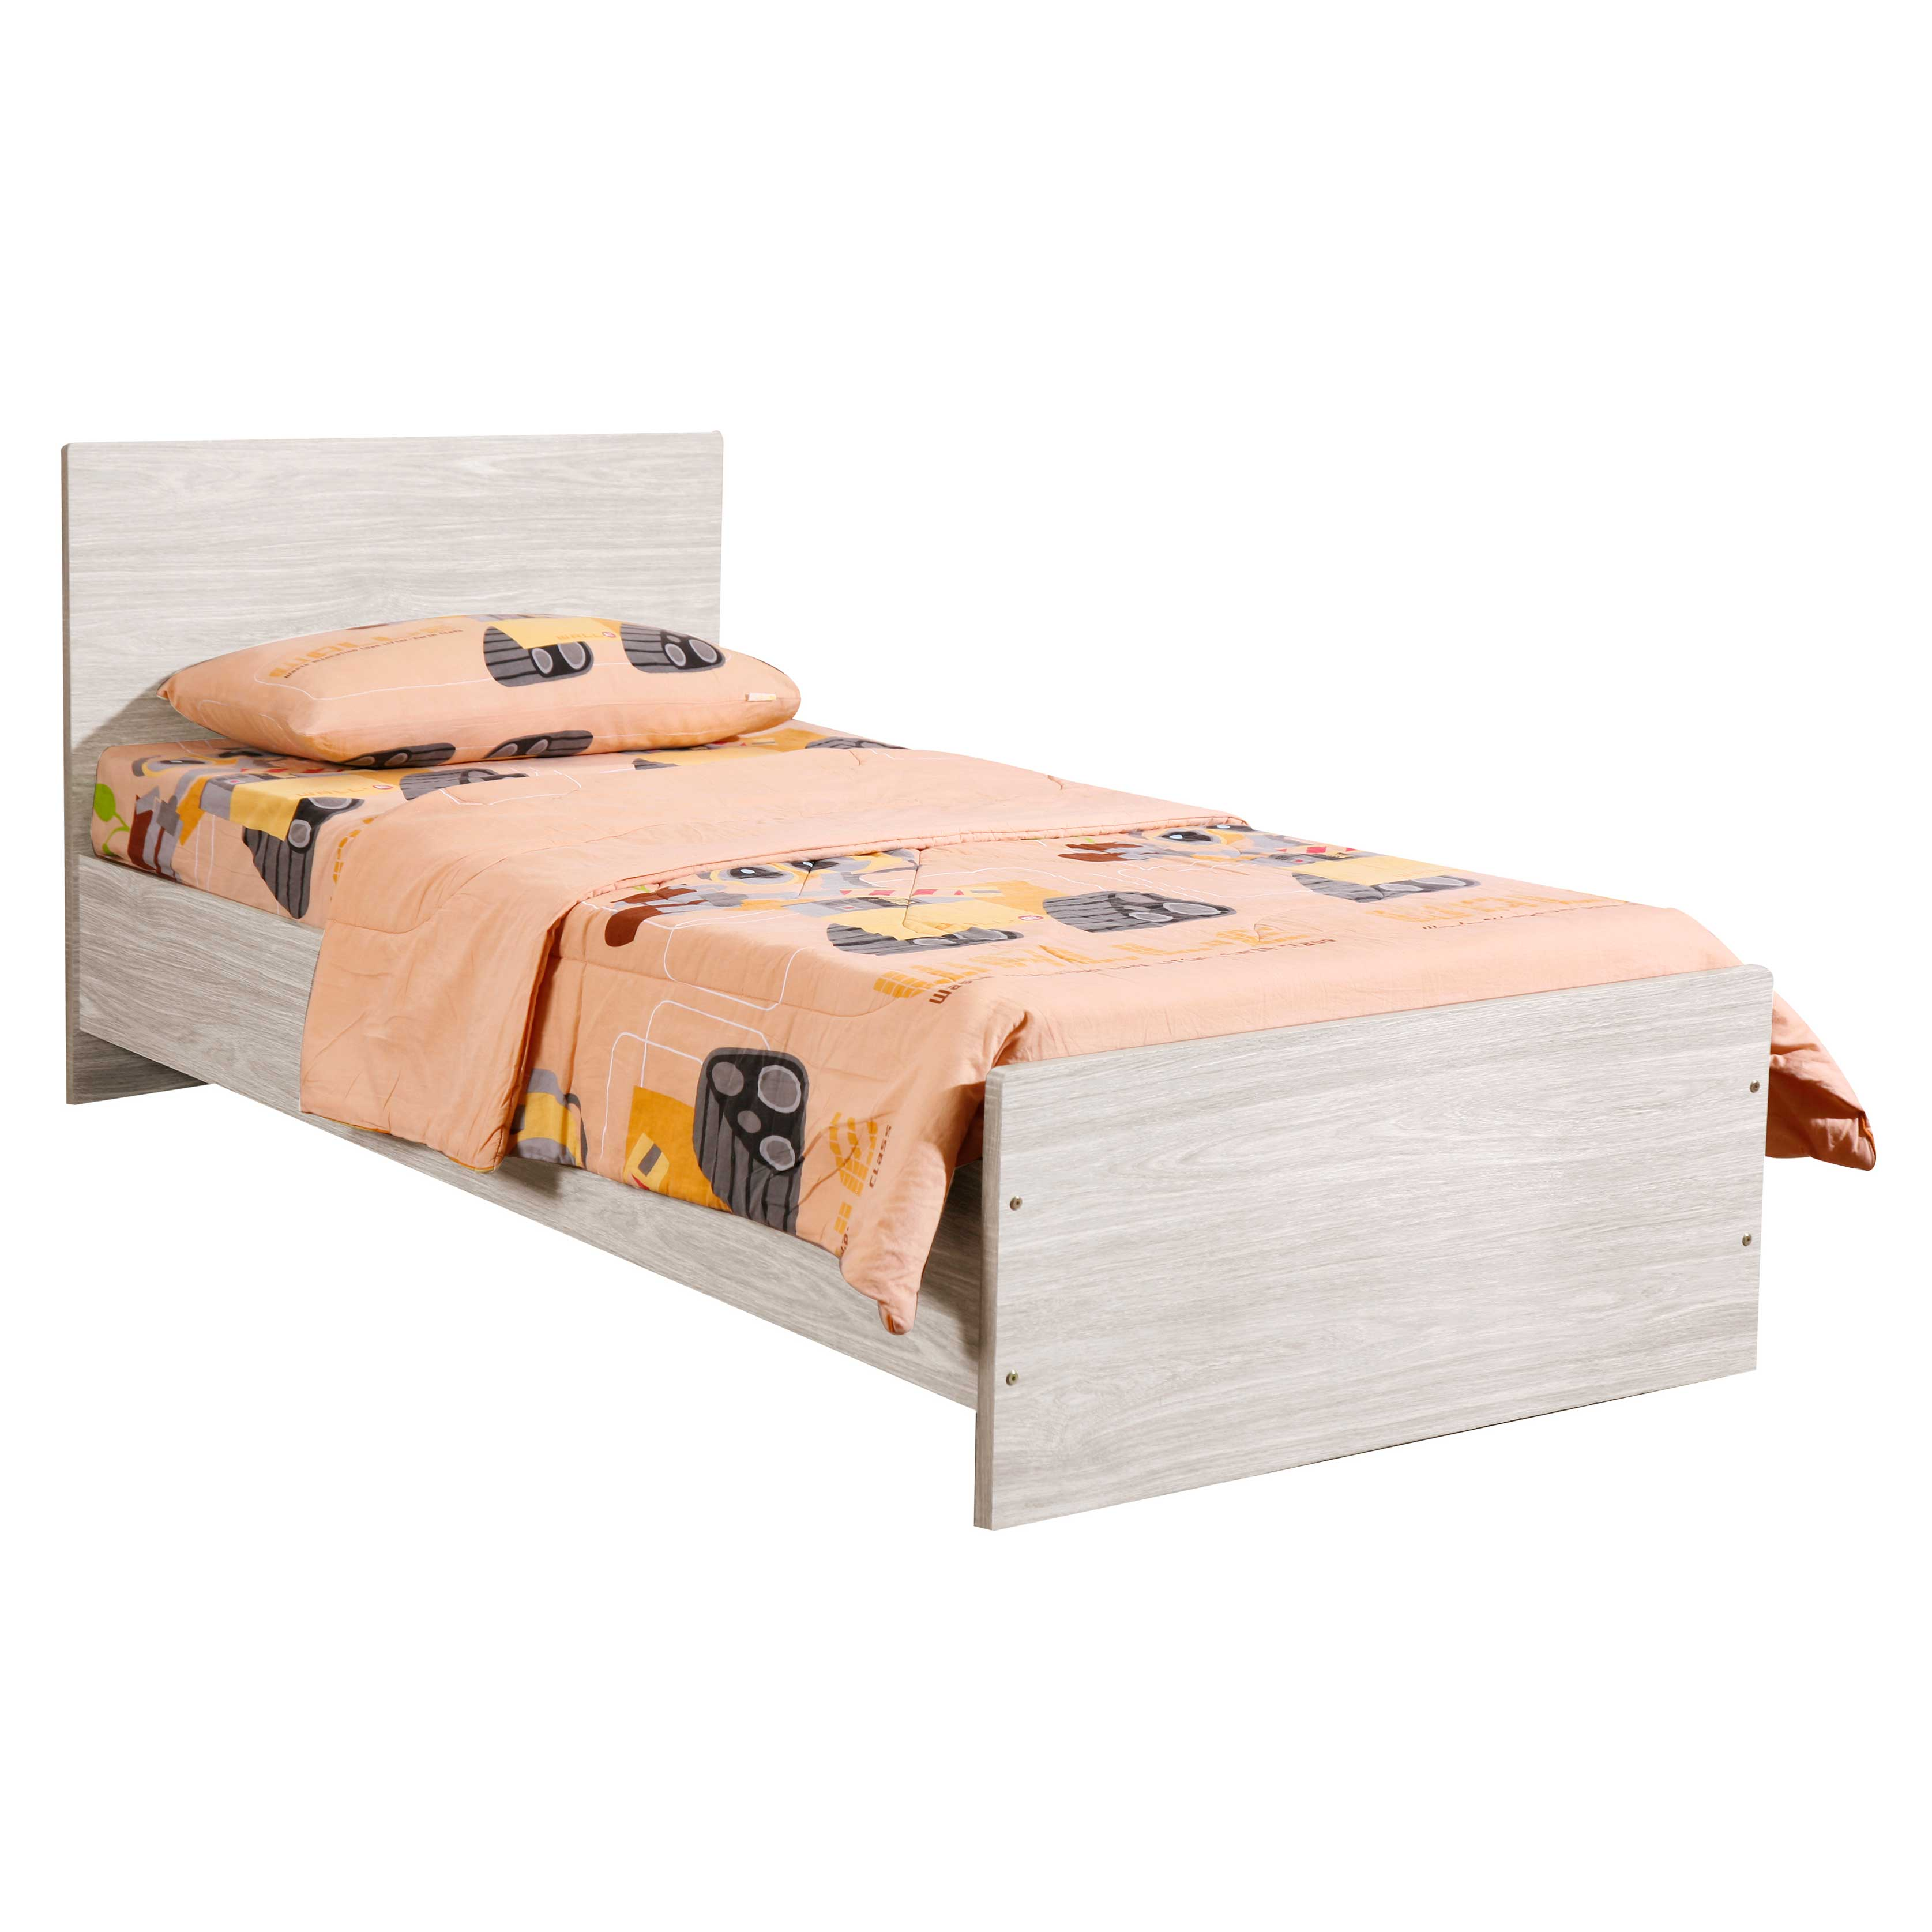 Bed Tomorrow 90x200 cm - eik/grijs